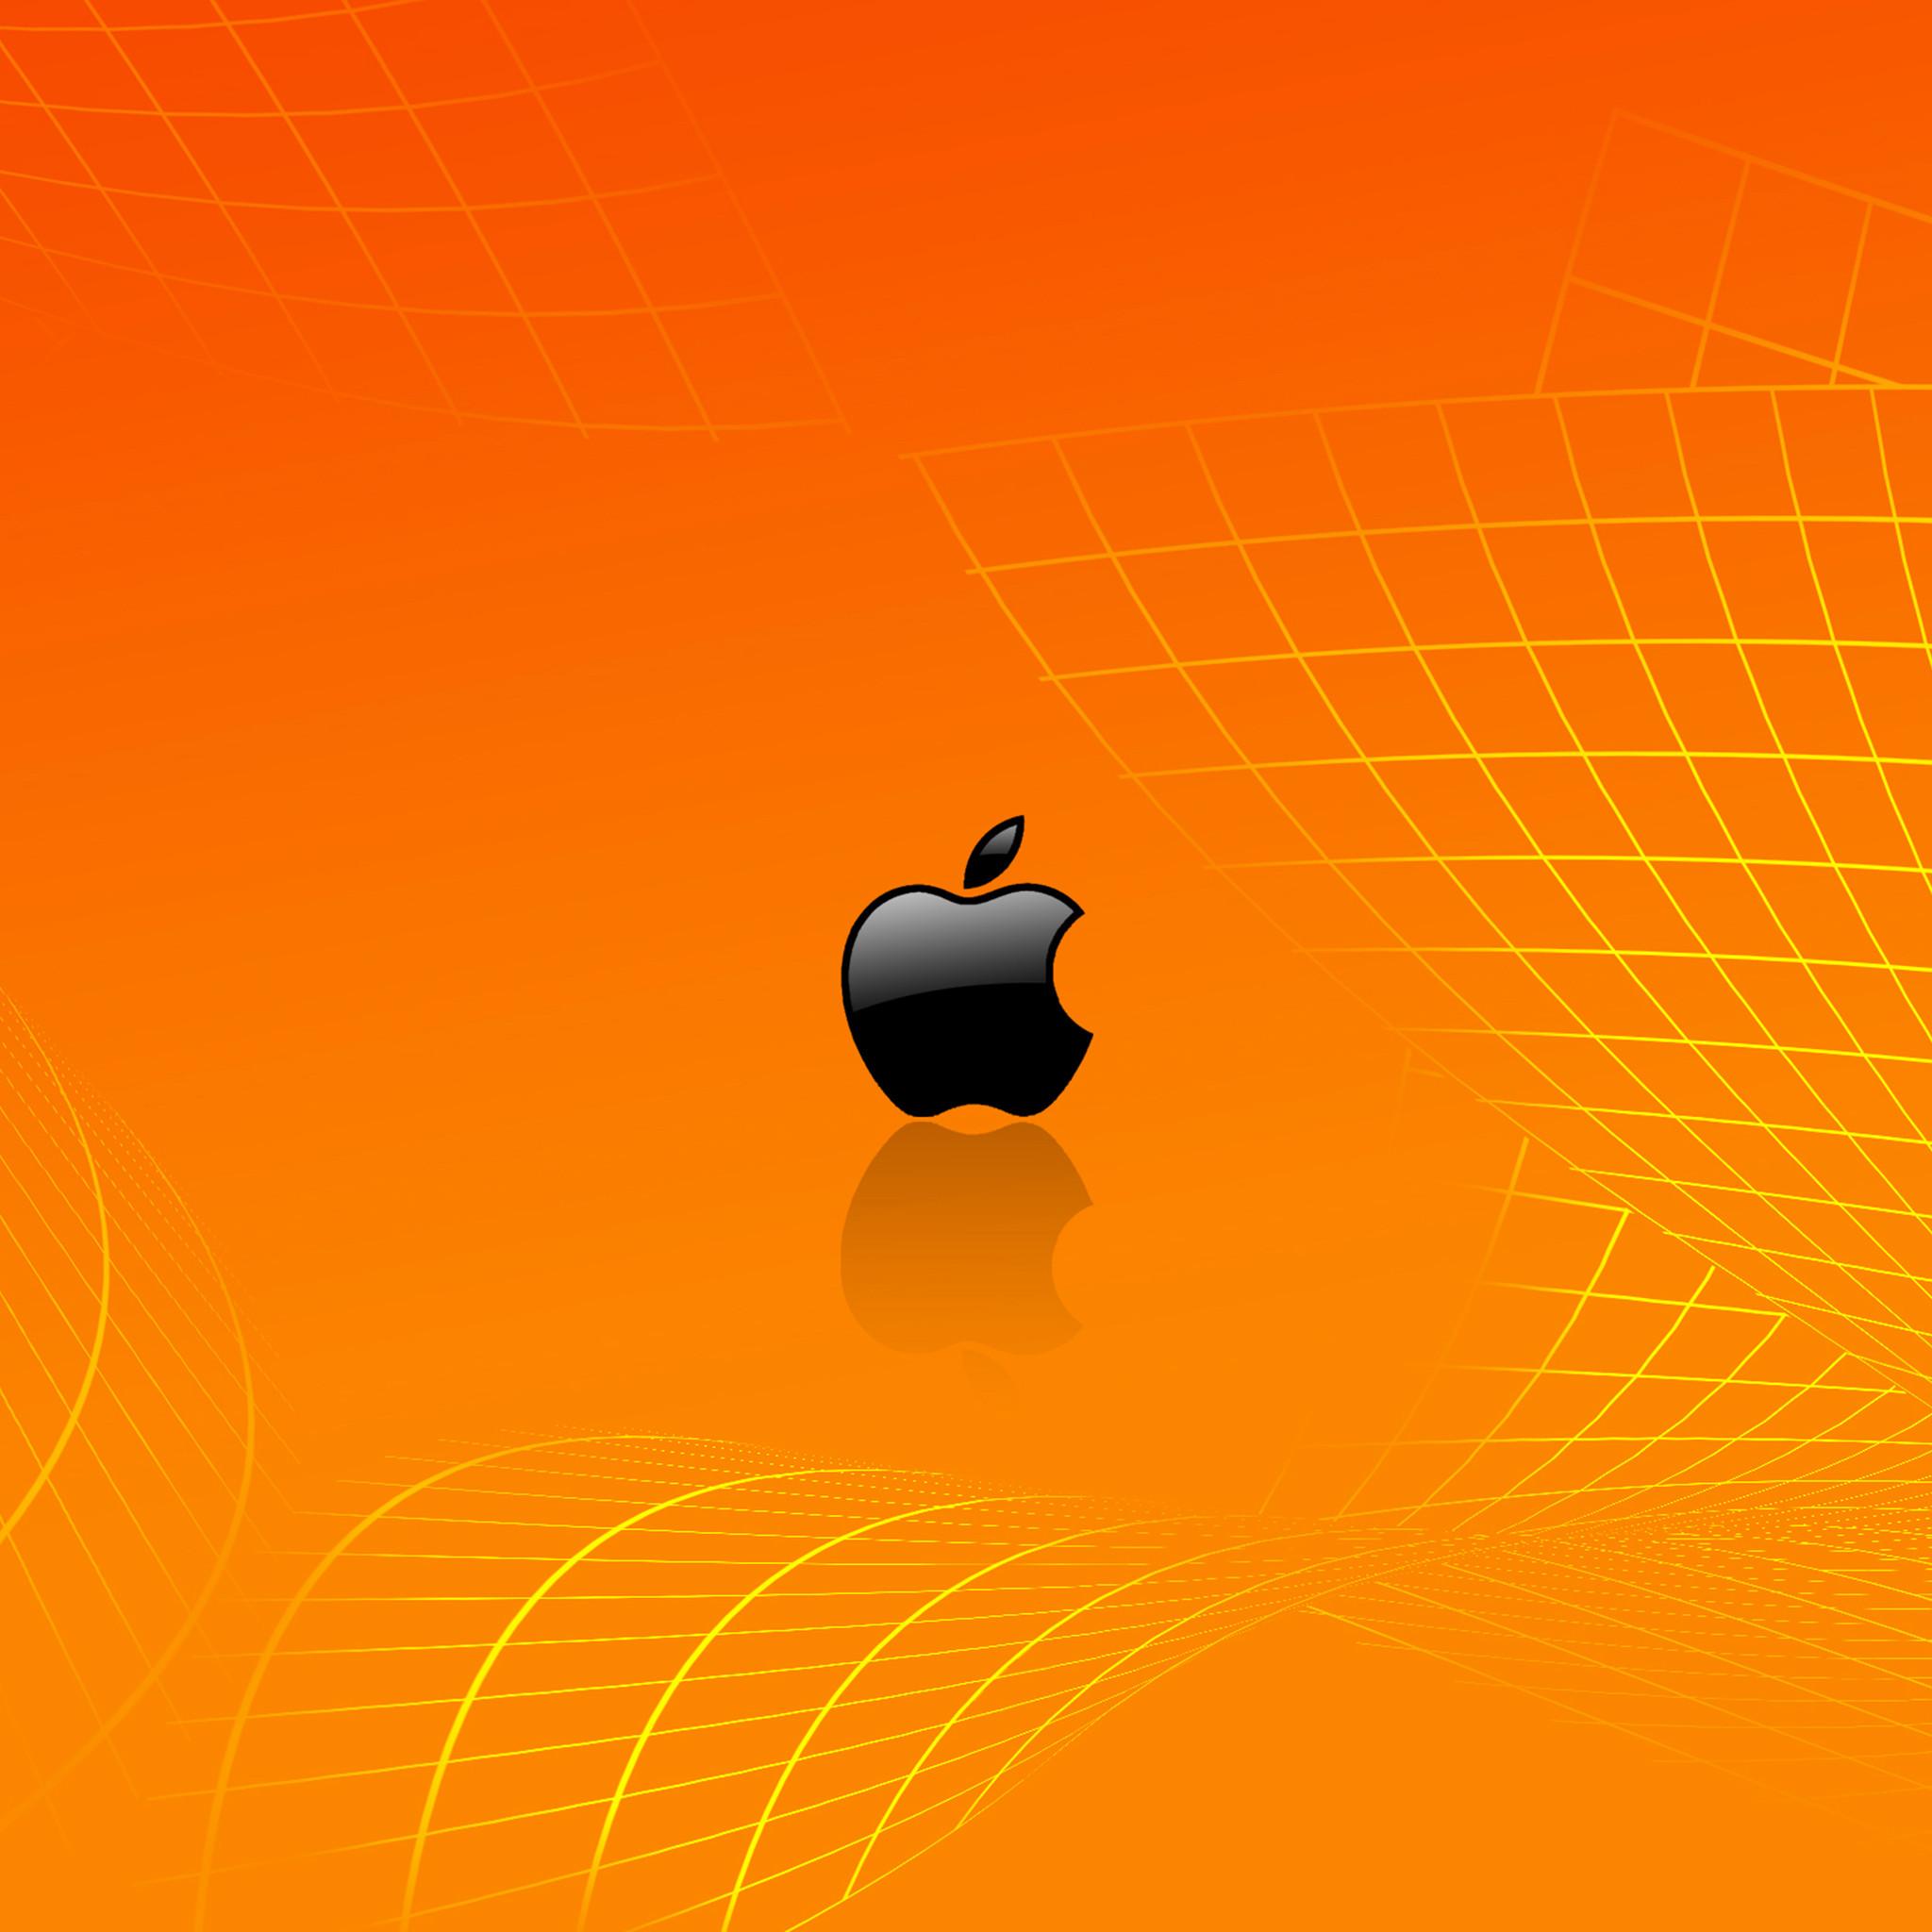 48 Orange Iphone Wallpaper On Wallpapersafari